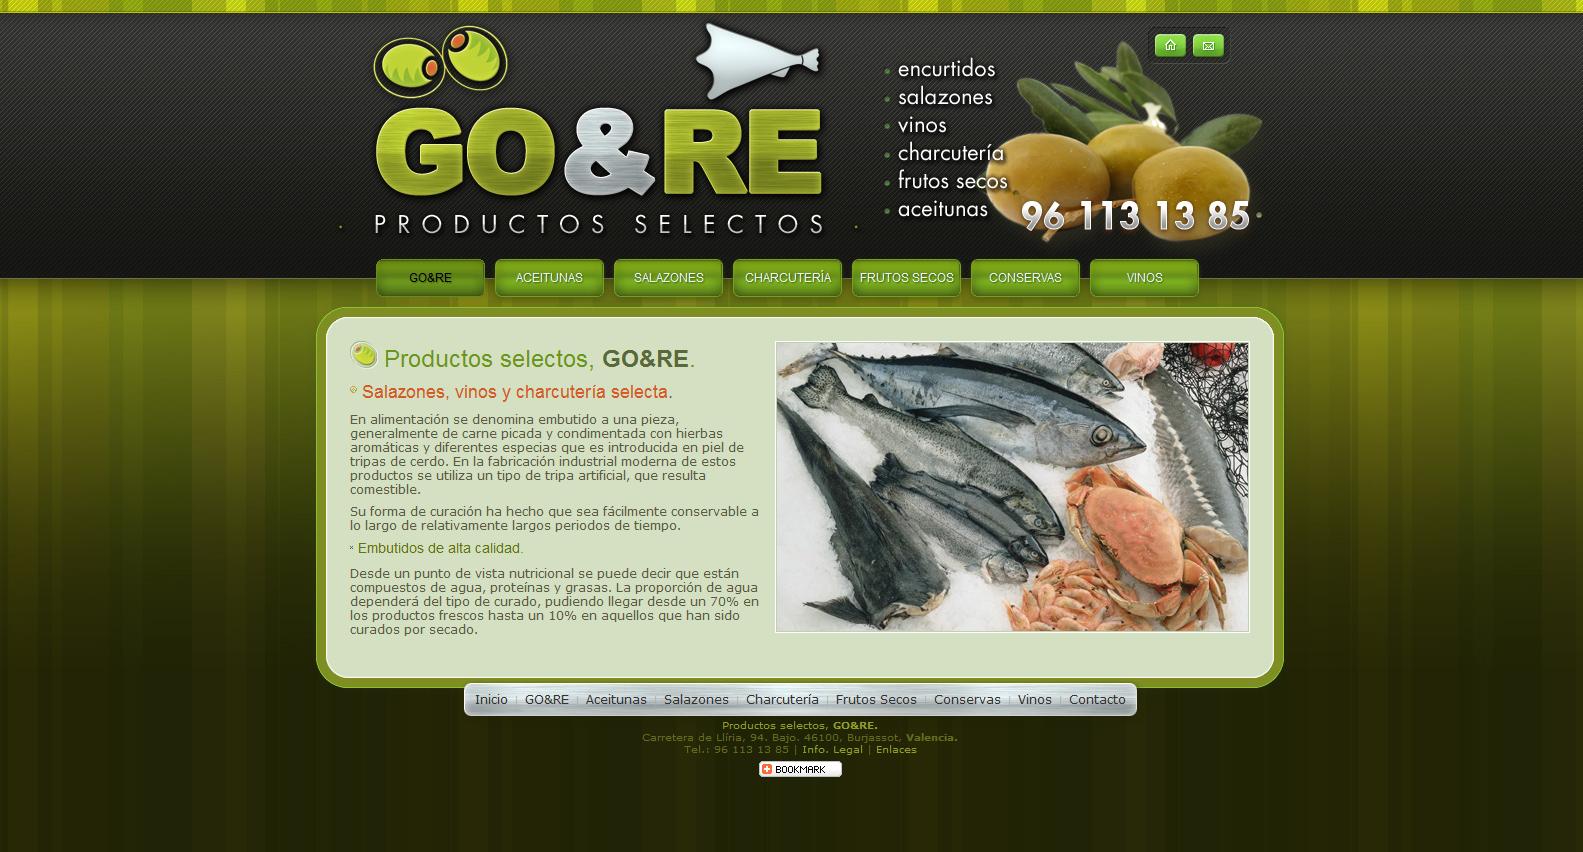 Go & Re